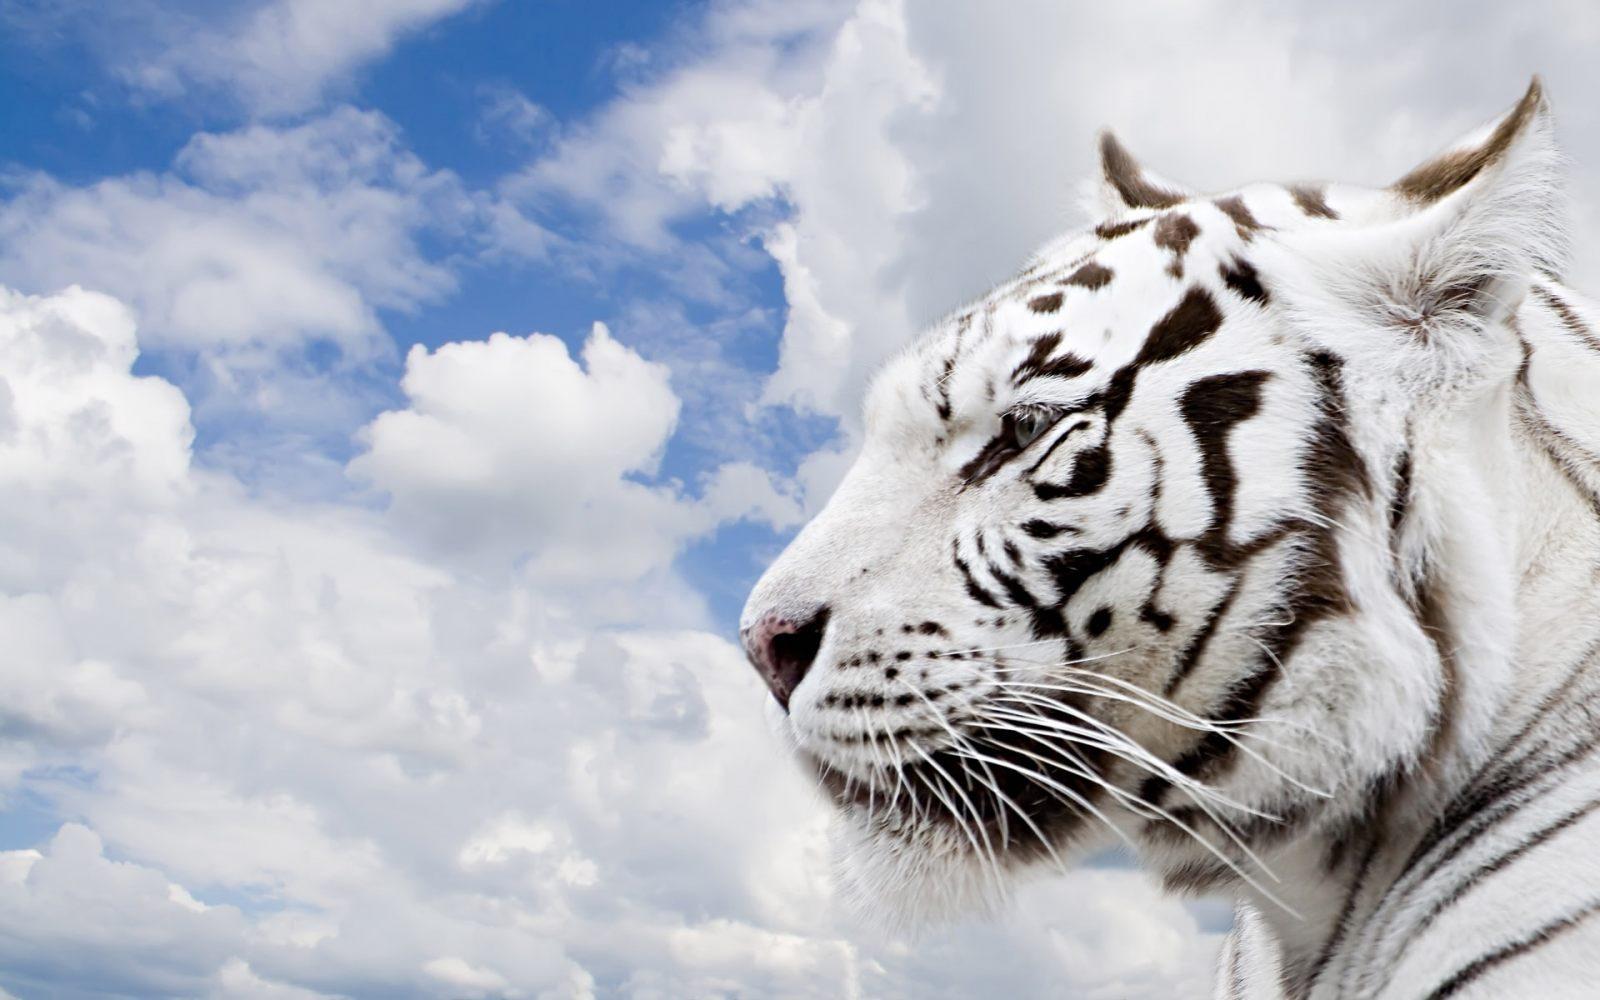 Animales Felino Leopardos Fondo De Pantalla Fondos De: Galería De Imágenes: Fondos De Pantalla De Felinos